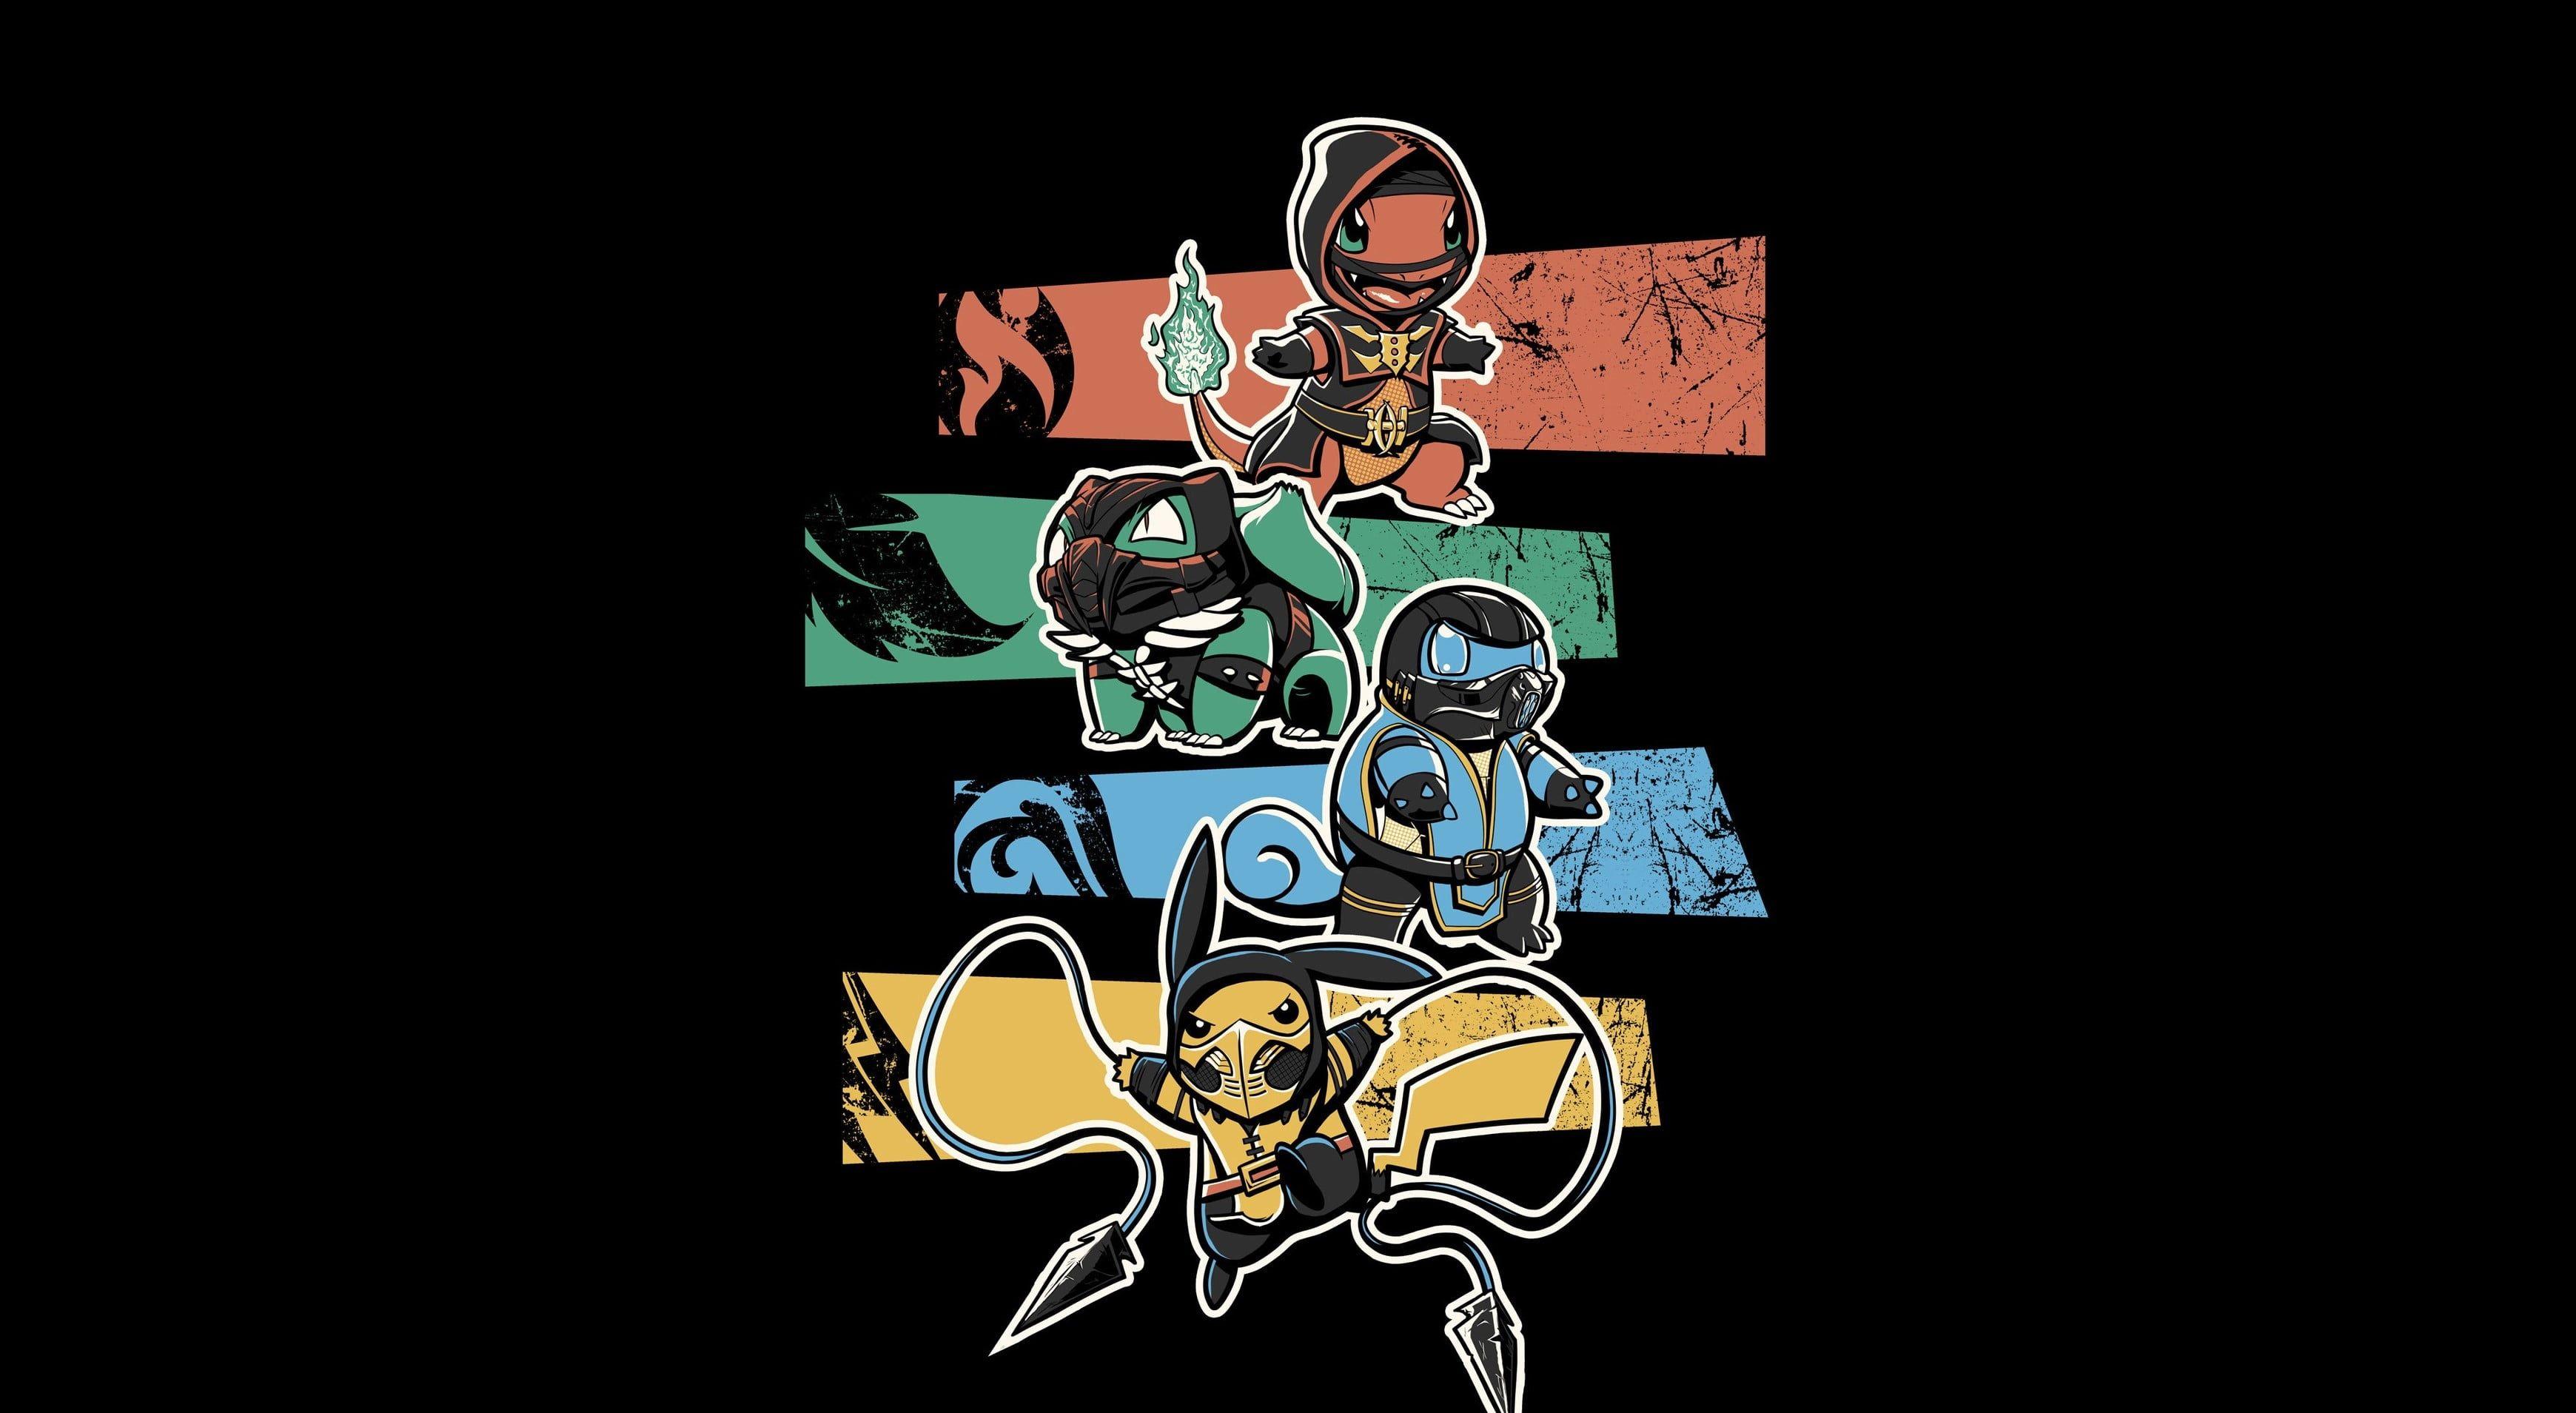 Pokemon Black Cartoon Pikachu 2k Wallpaper Hdwallpaper Desktop Black Pokemon Pikachu Wallpaper Character Wallpaper